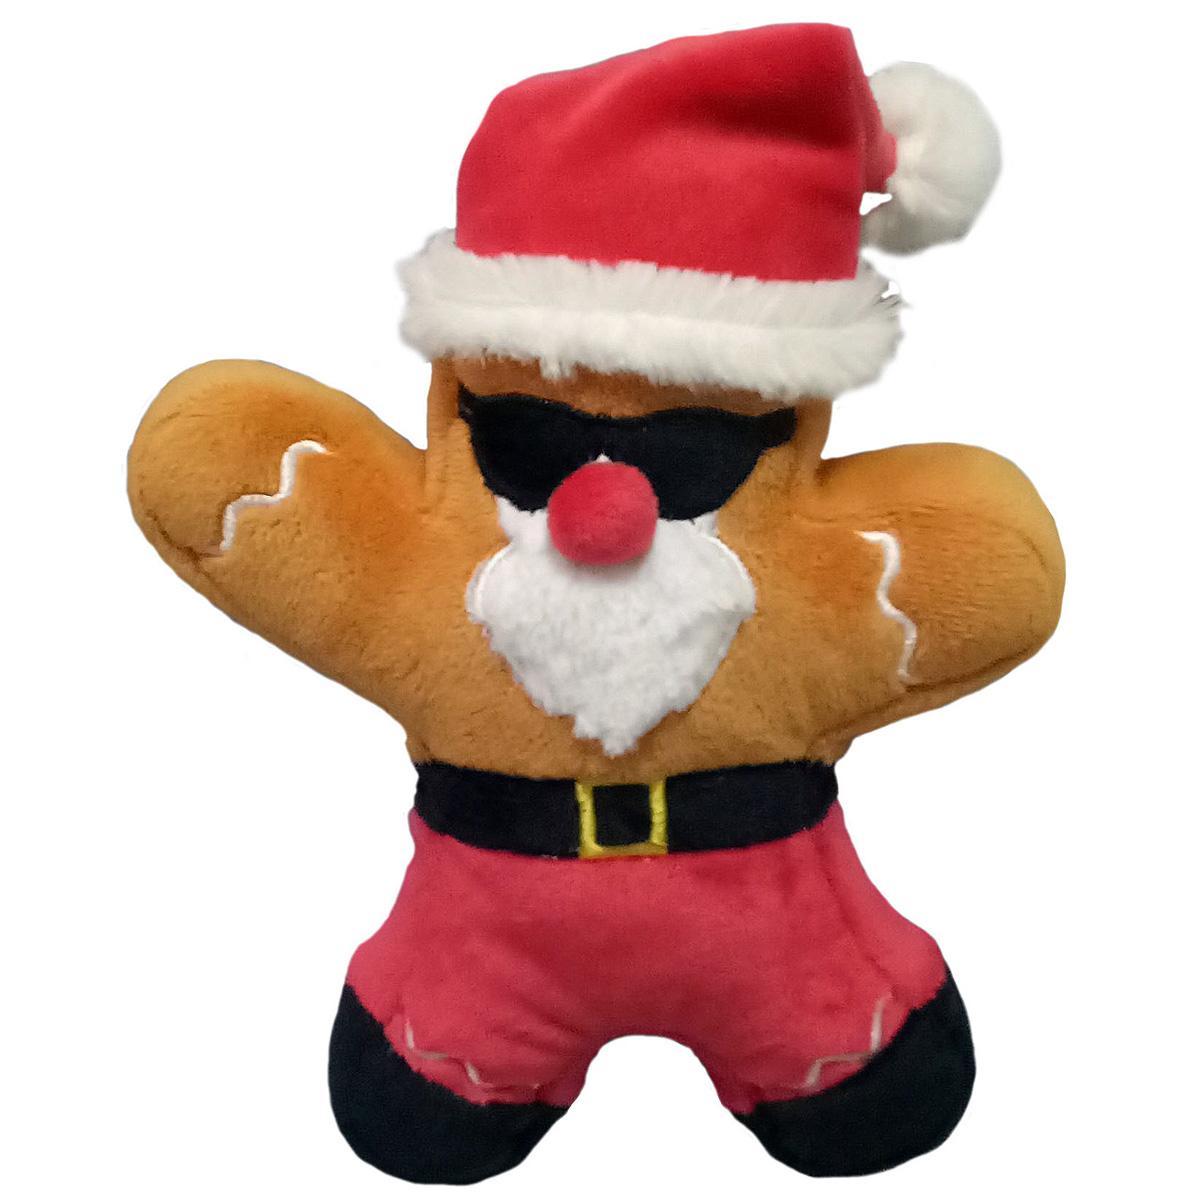 Lulubelles Power Plush Holiday Dog Toy - Snowbird Santa